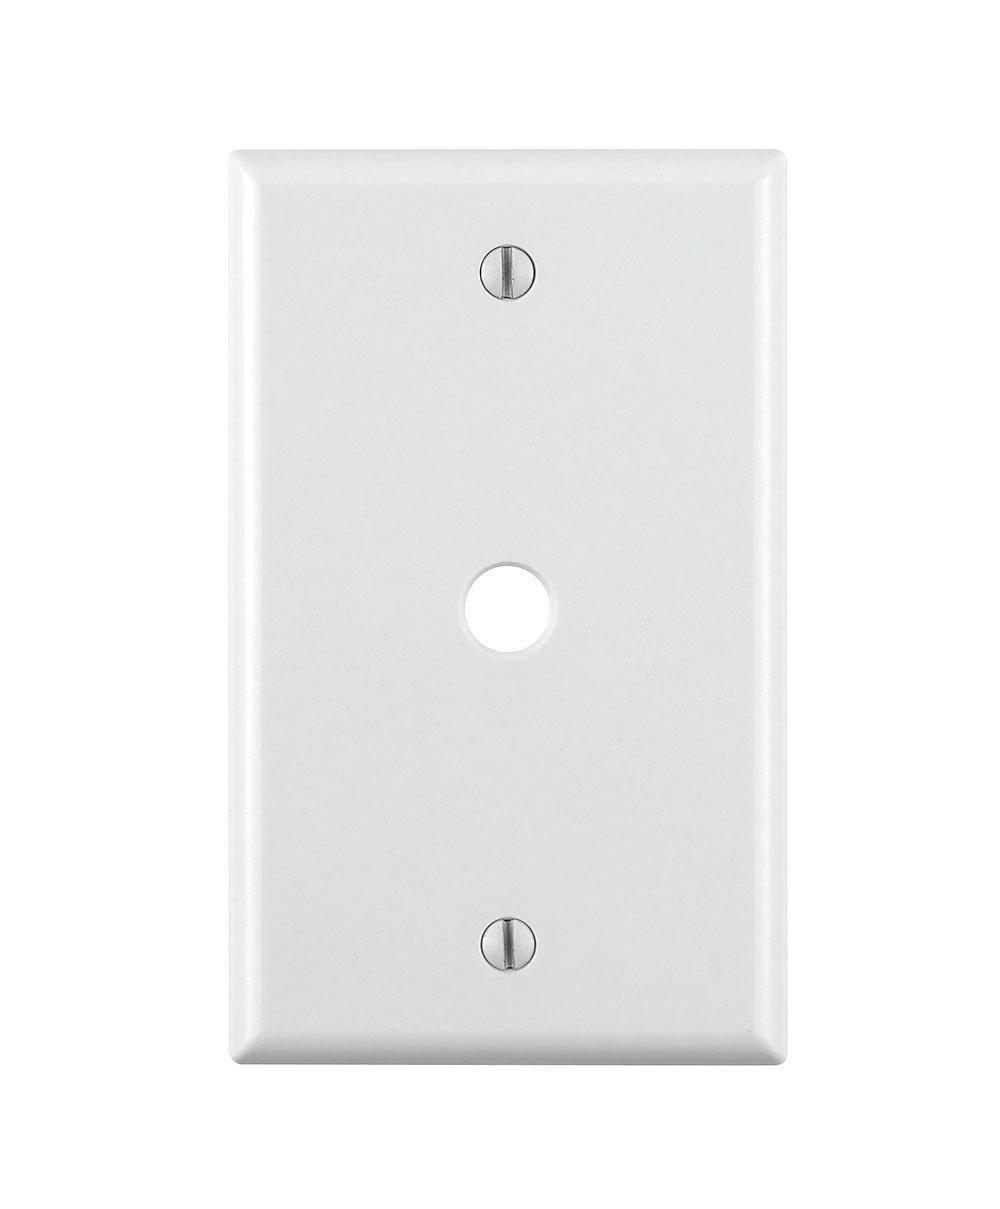 Leviton 88013 001-000 標準サイズ 電話/ケーブル壁プレート 1ギャング 長さ4-1/2インチ x 幅2-3/4インチ 高さ0.22インチ 3  B07P3K6FXR